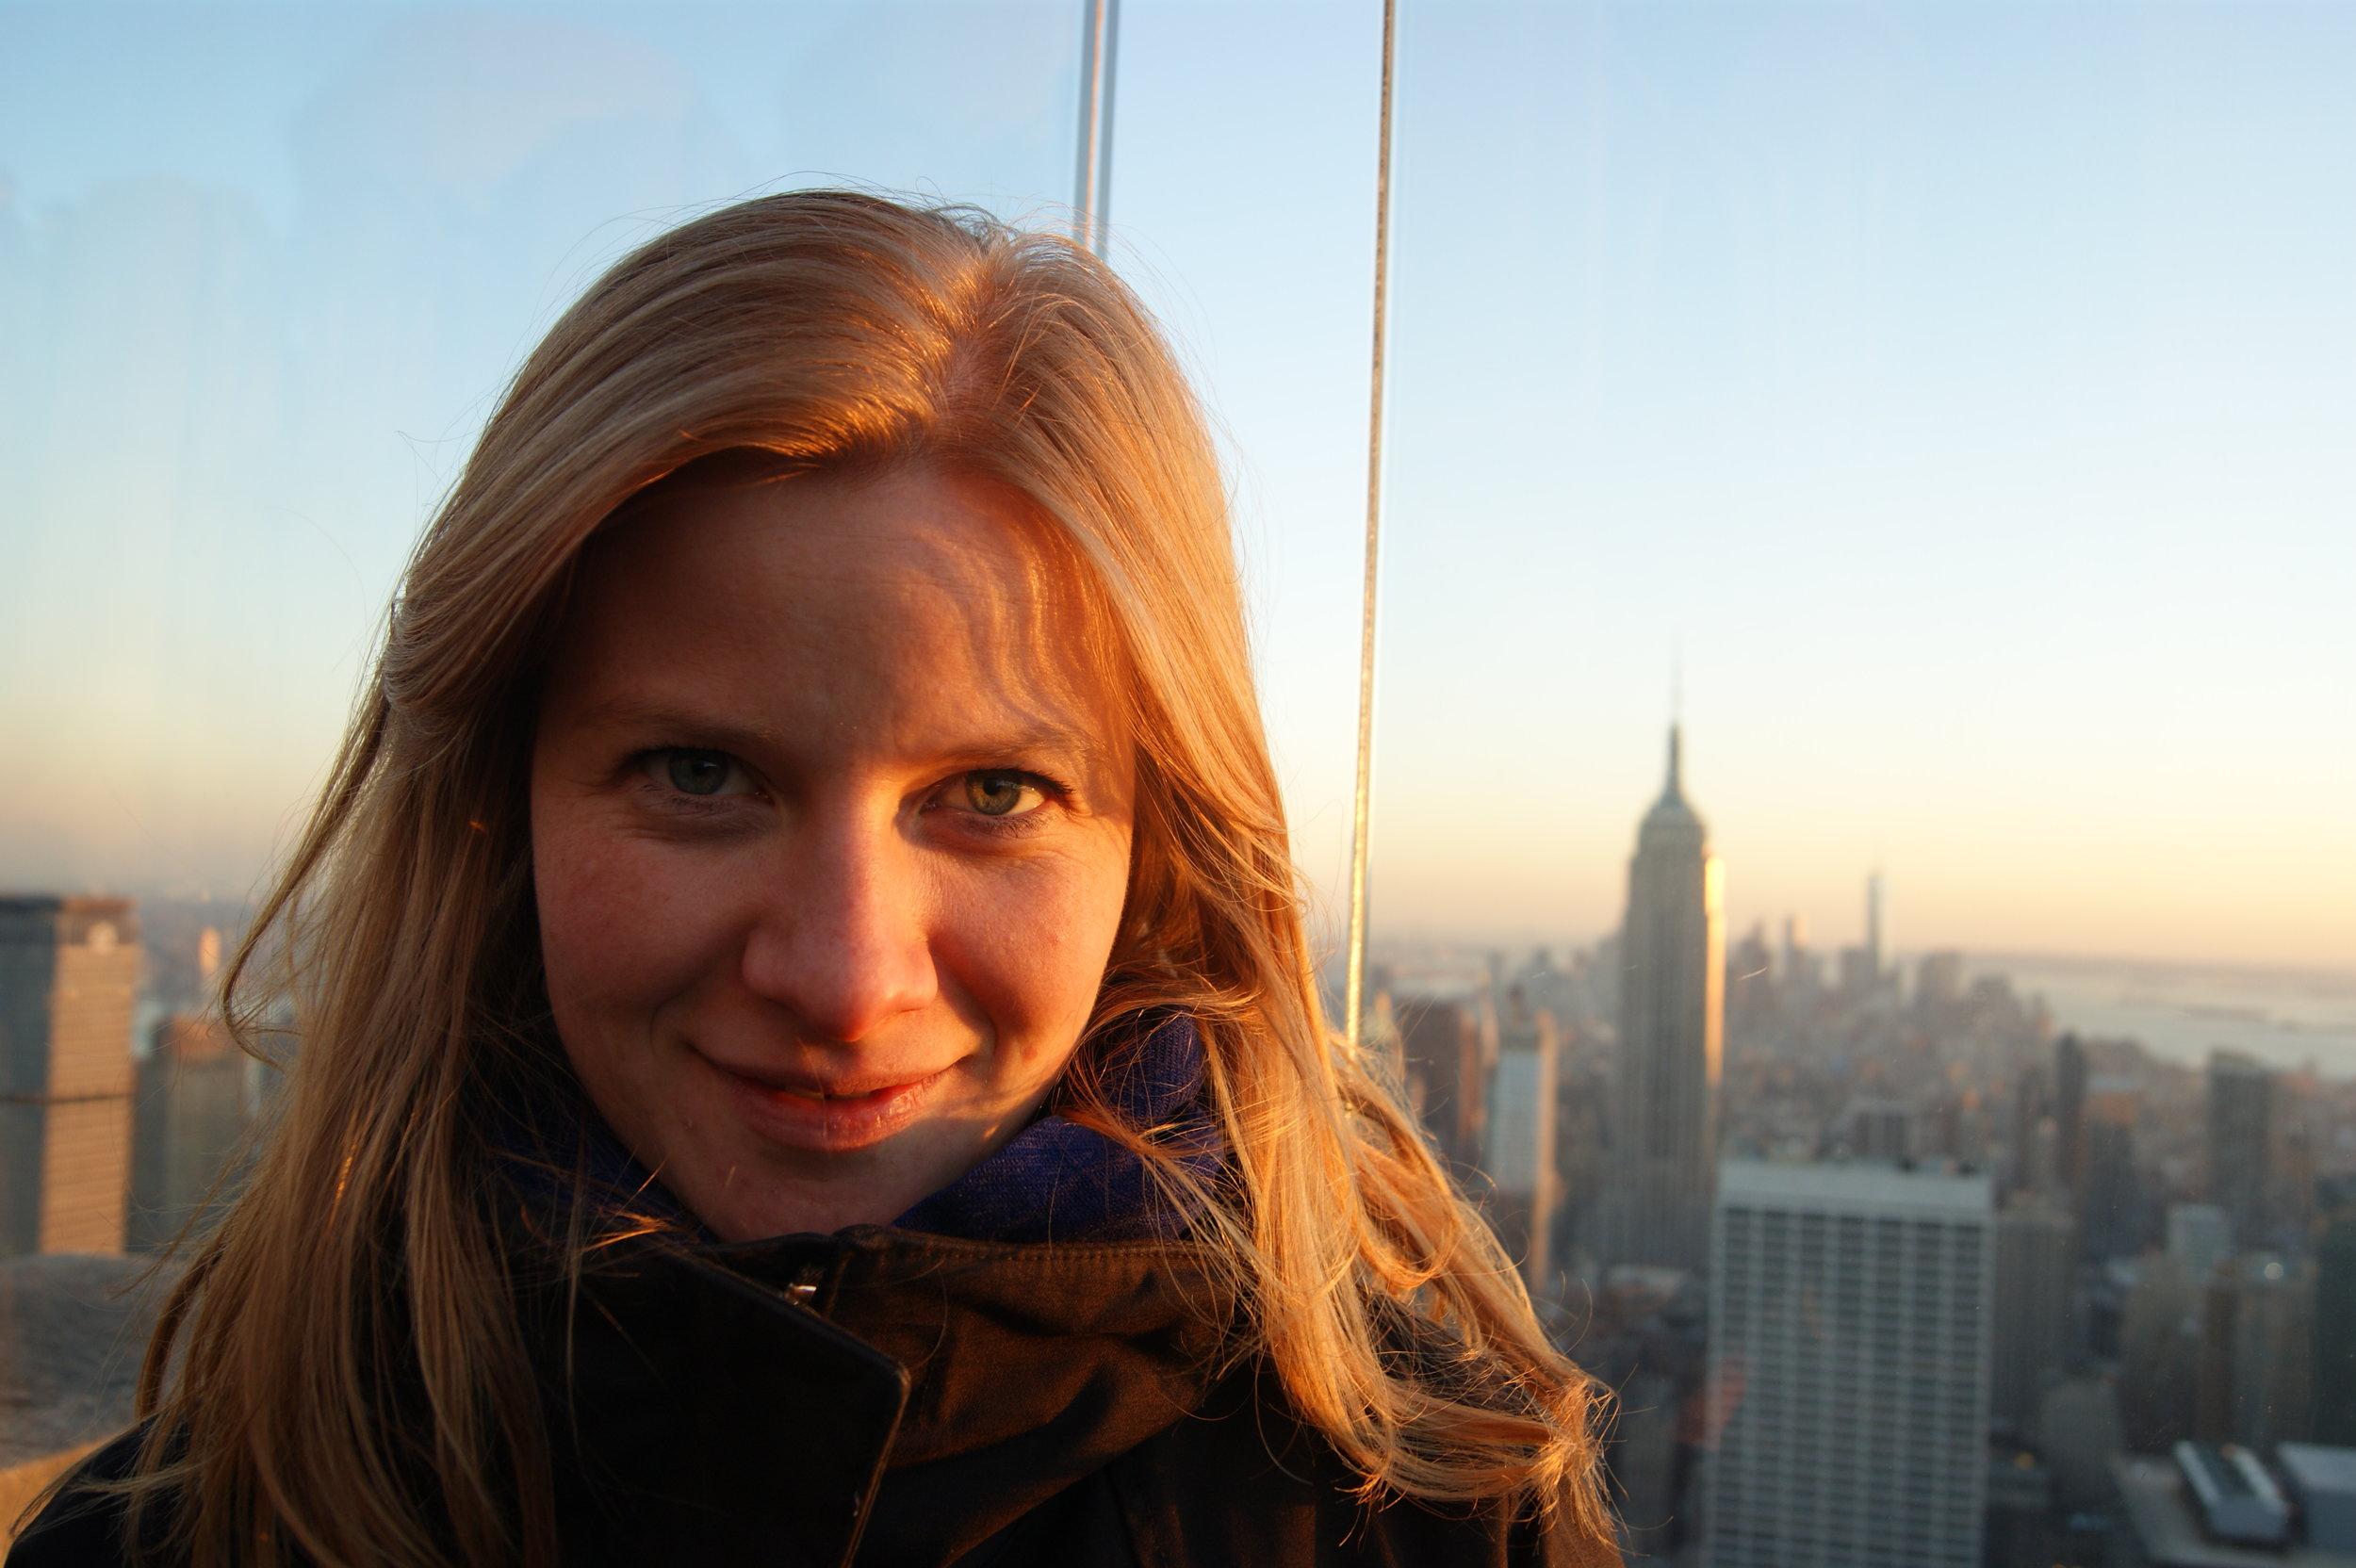 Caroline Bjerglund Andersen